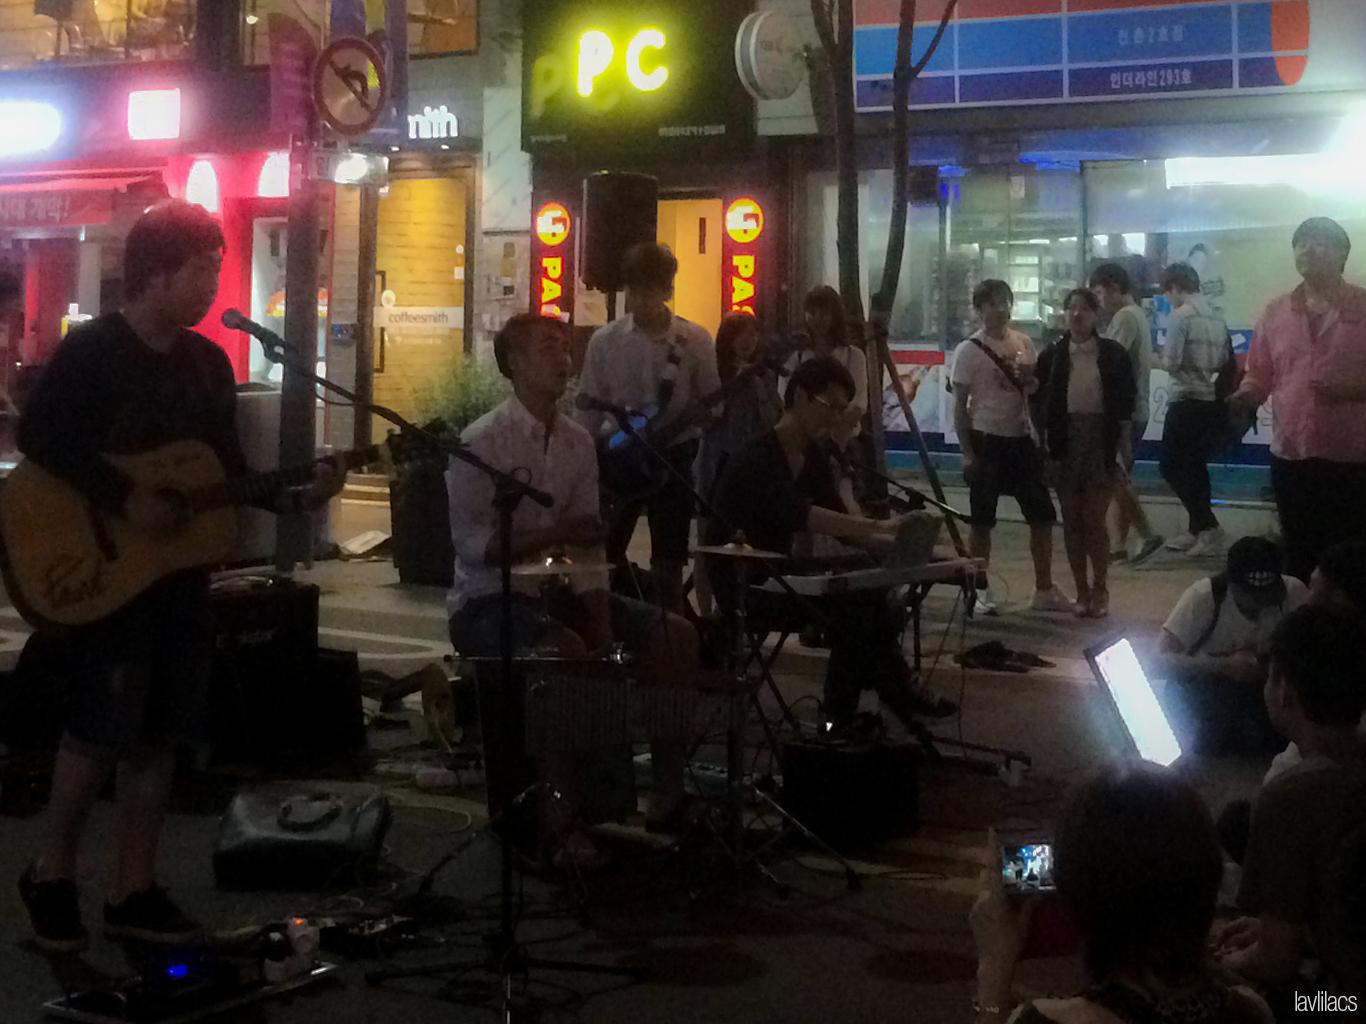 Seoul, Korea - Summer Study Abroad 2014 - Sinchon Street music at night